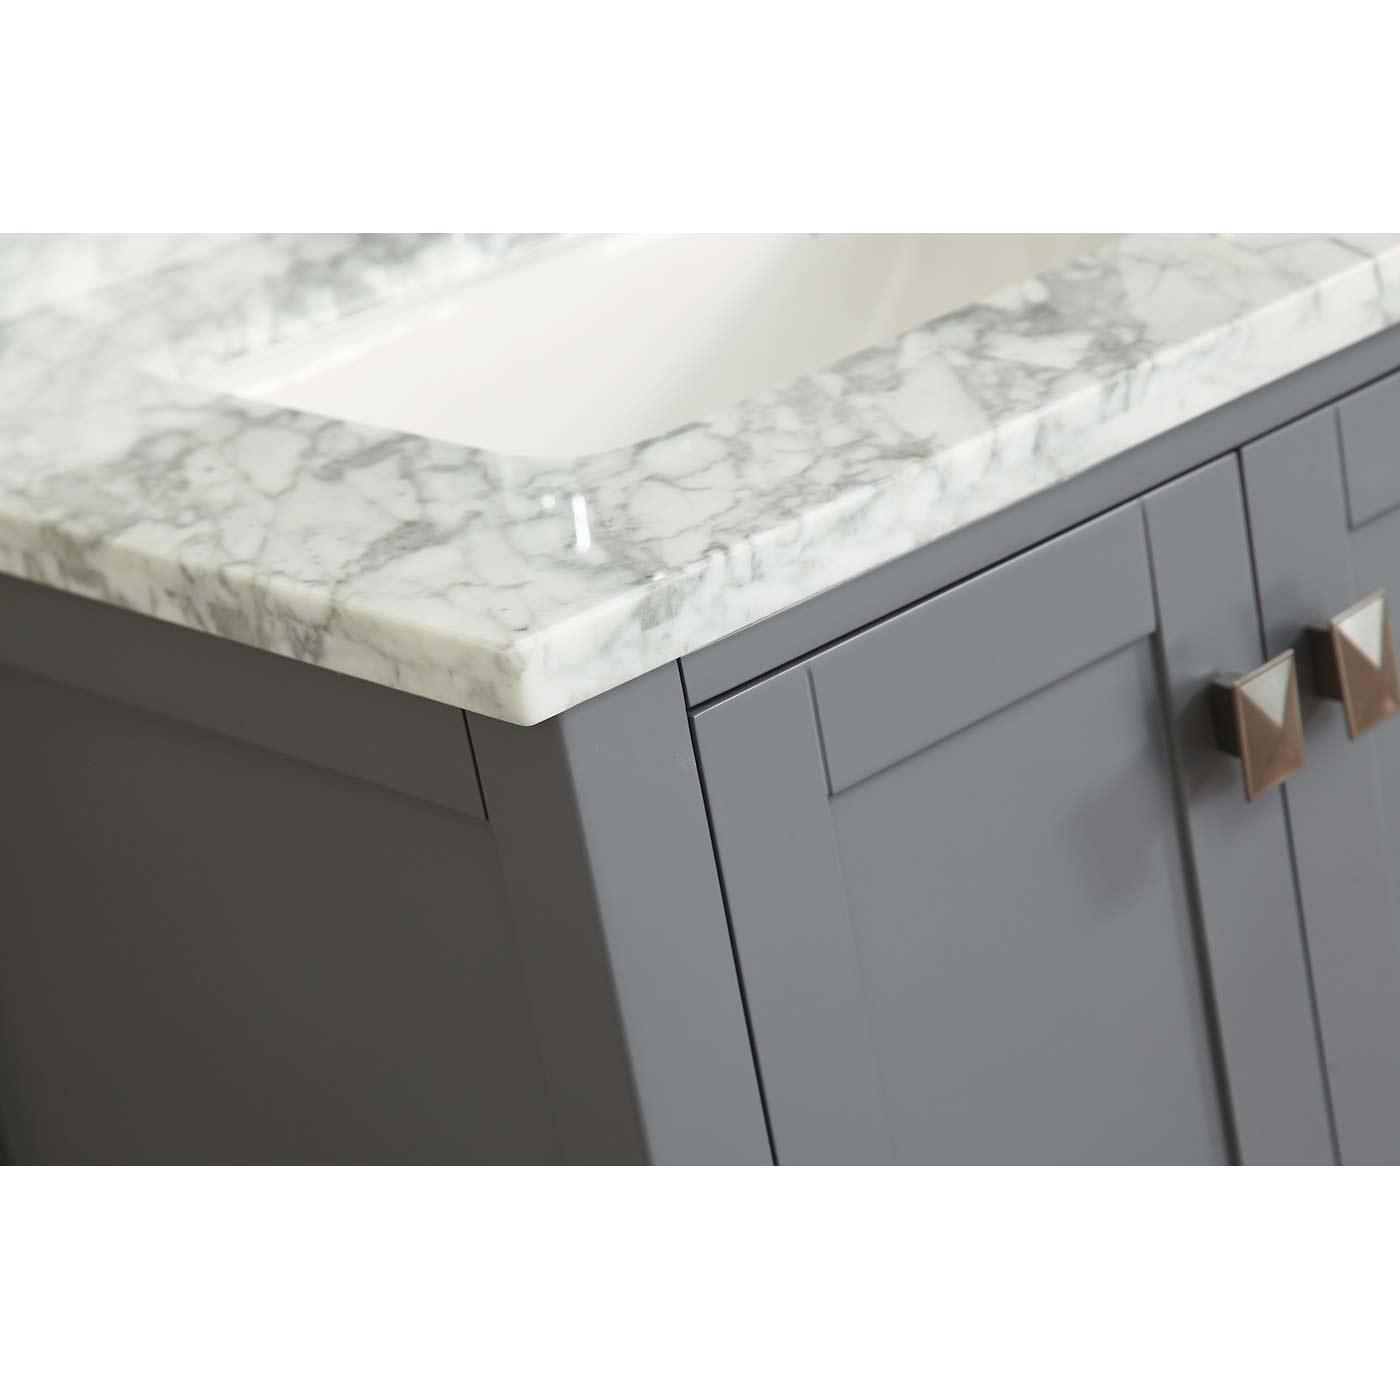 Buy vincent 36 inch solid wood single bathroom vanity in for Charcoal grey bathroom accessories